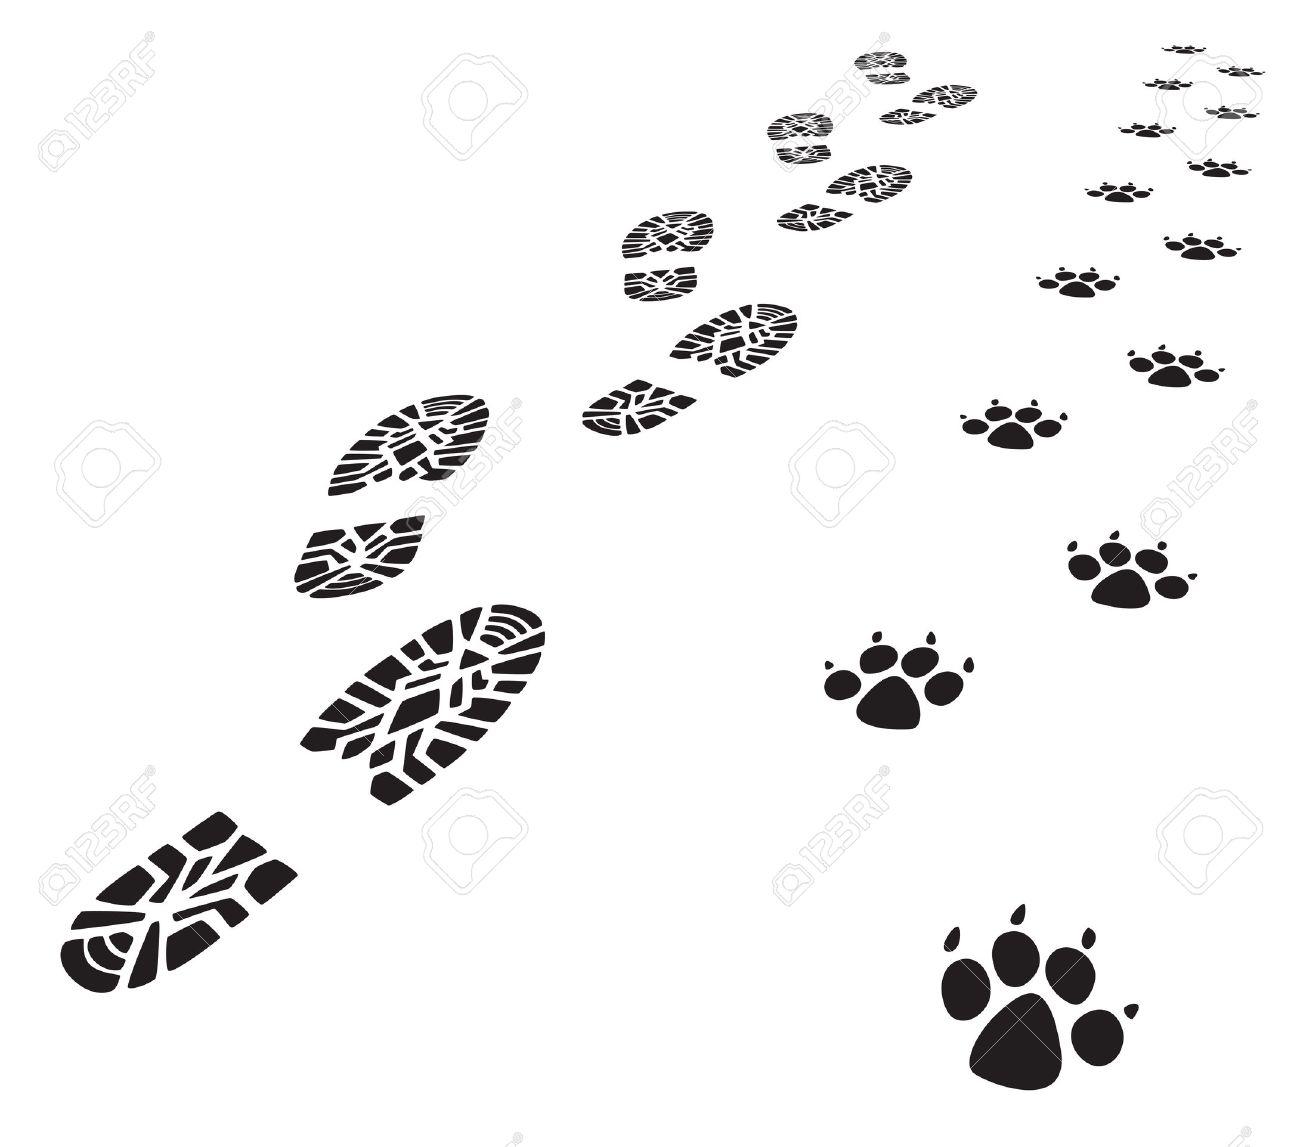 vector foot prints of man and dog - 31811097